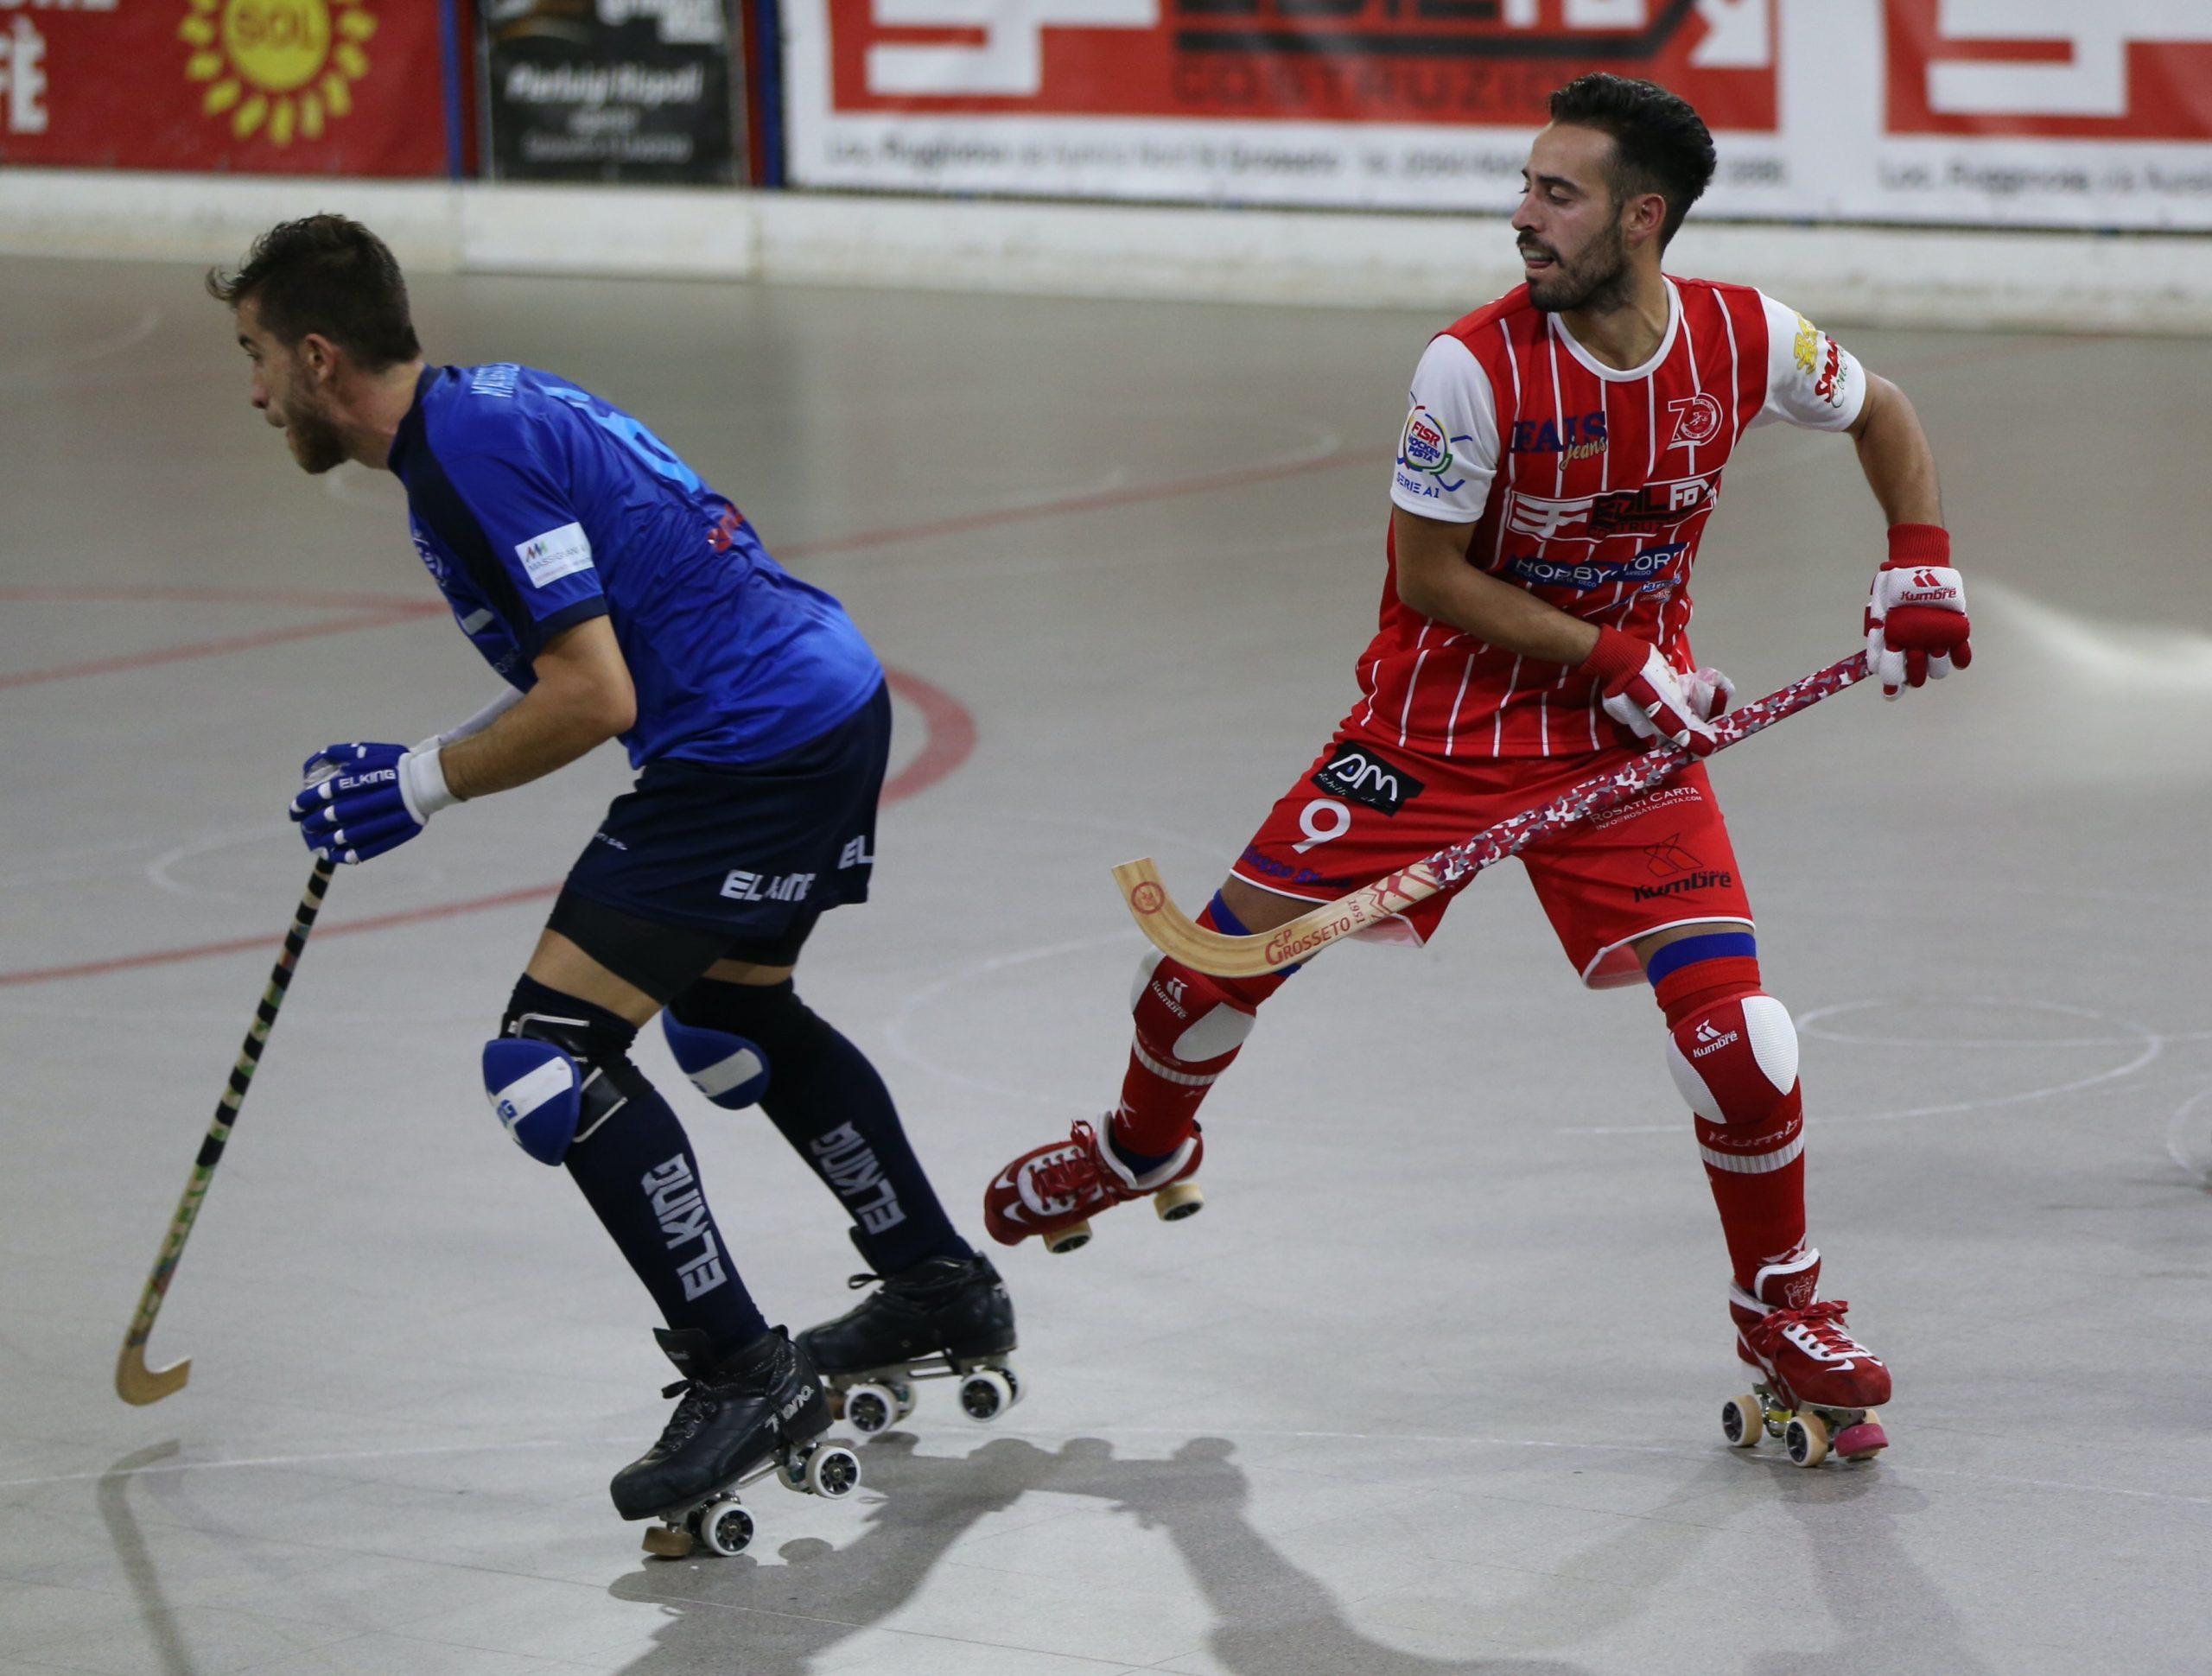 hockey-pista-circolo-pattinatori-grosseto-edilfox-Alessandro-Franchi